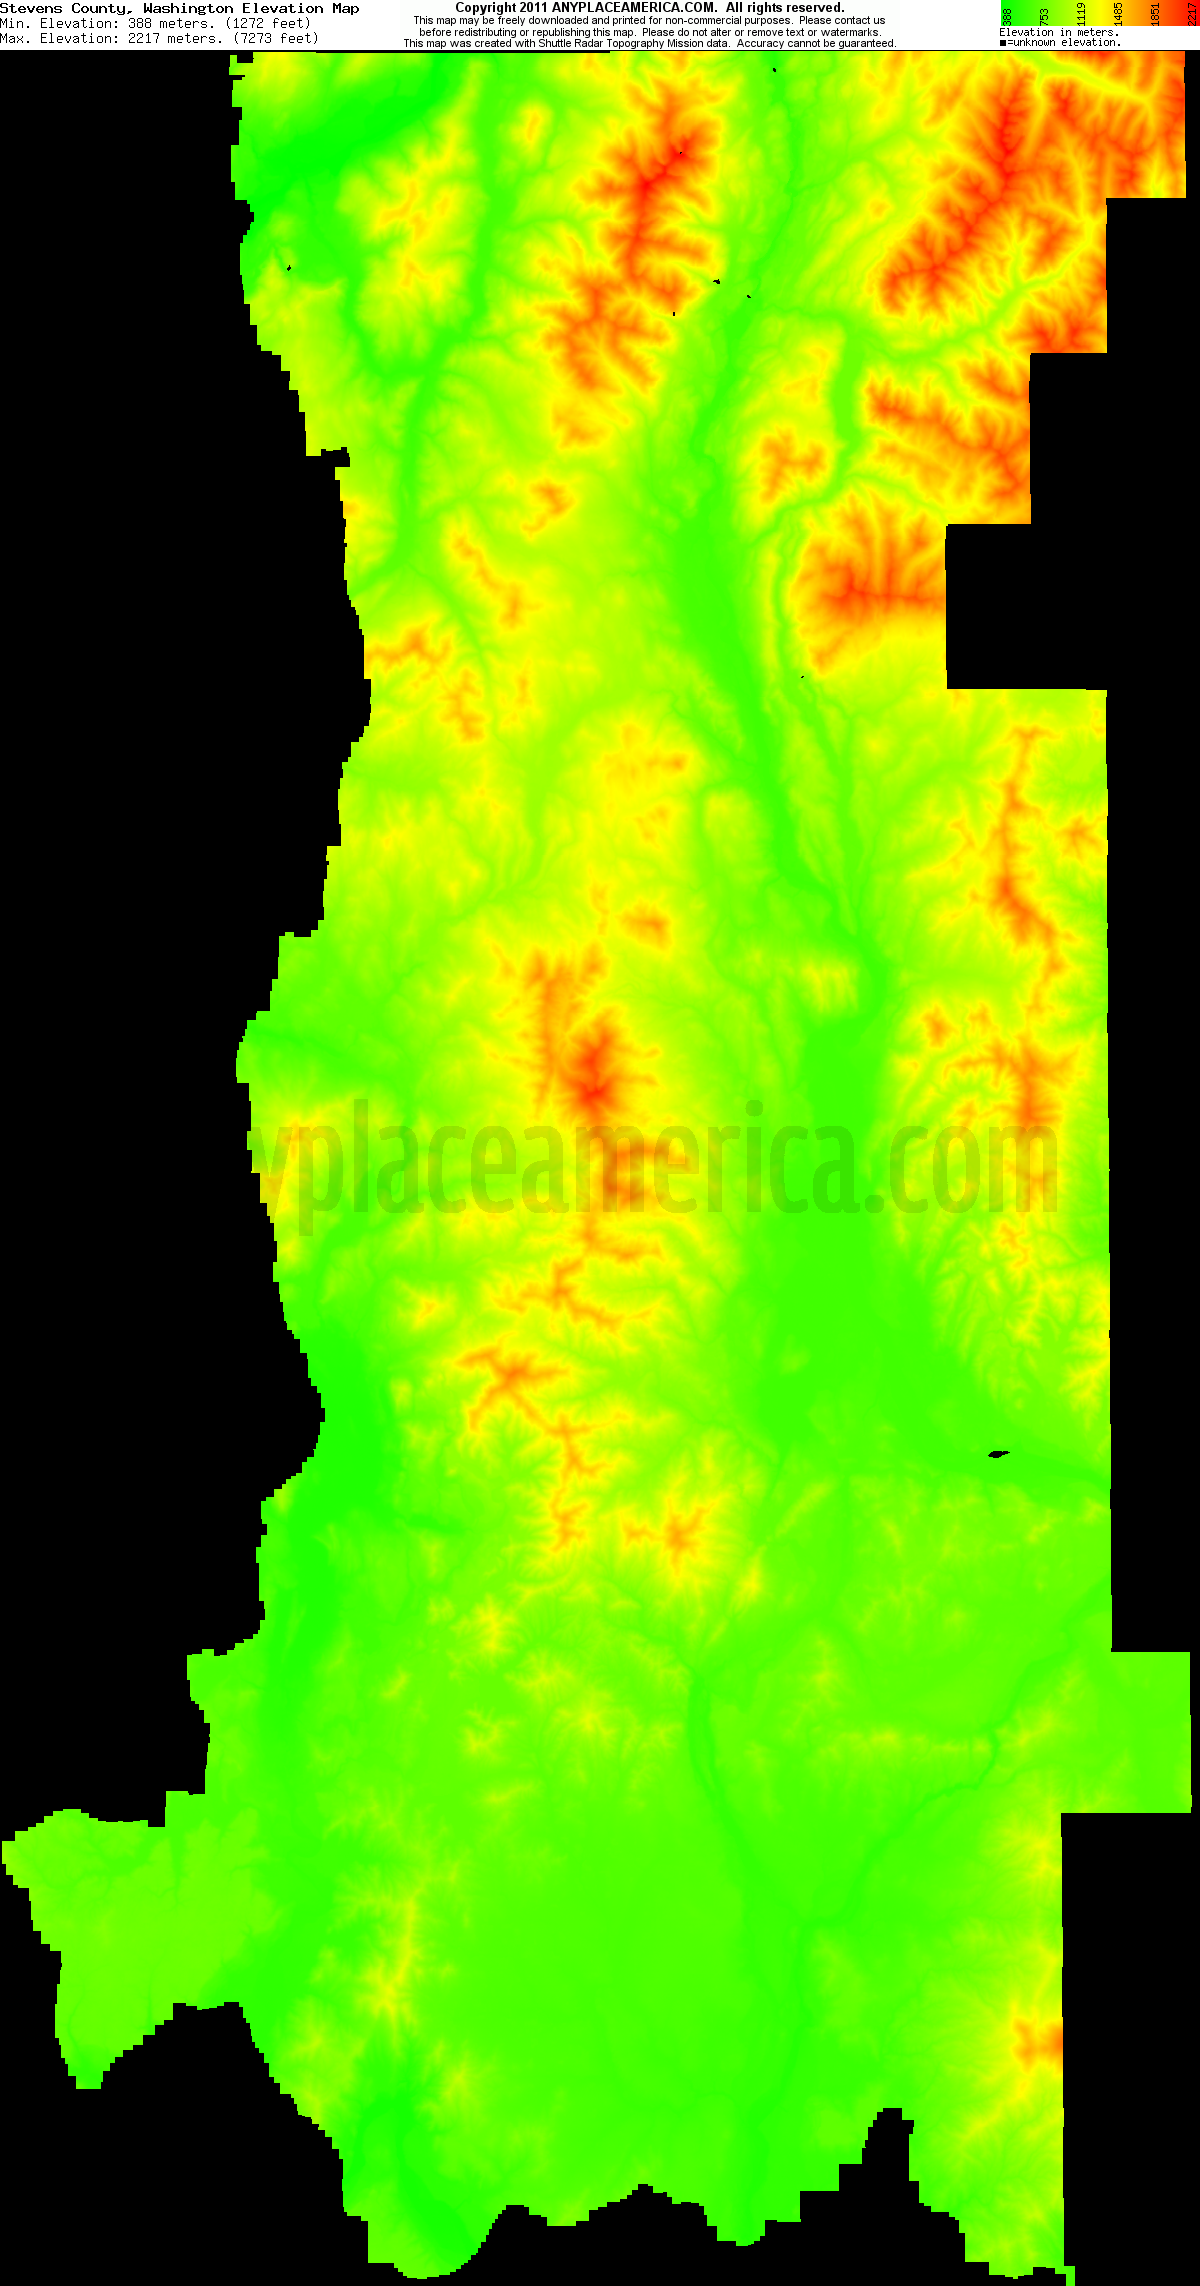 Stevens, Washington elevation map